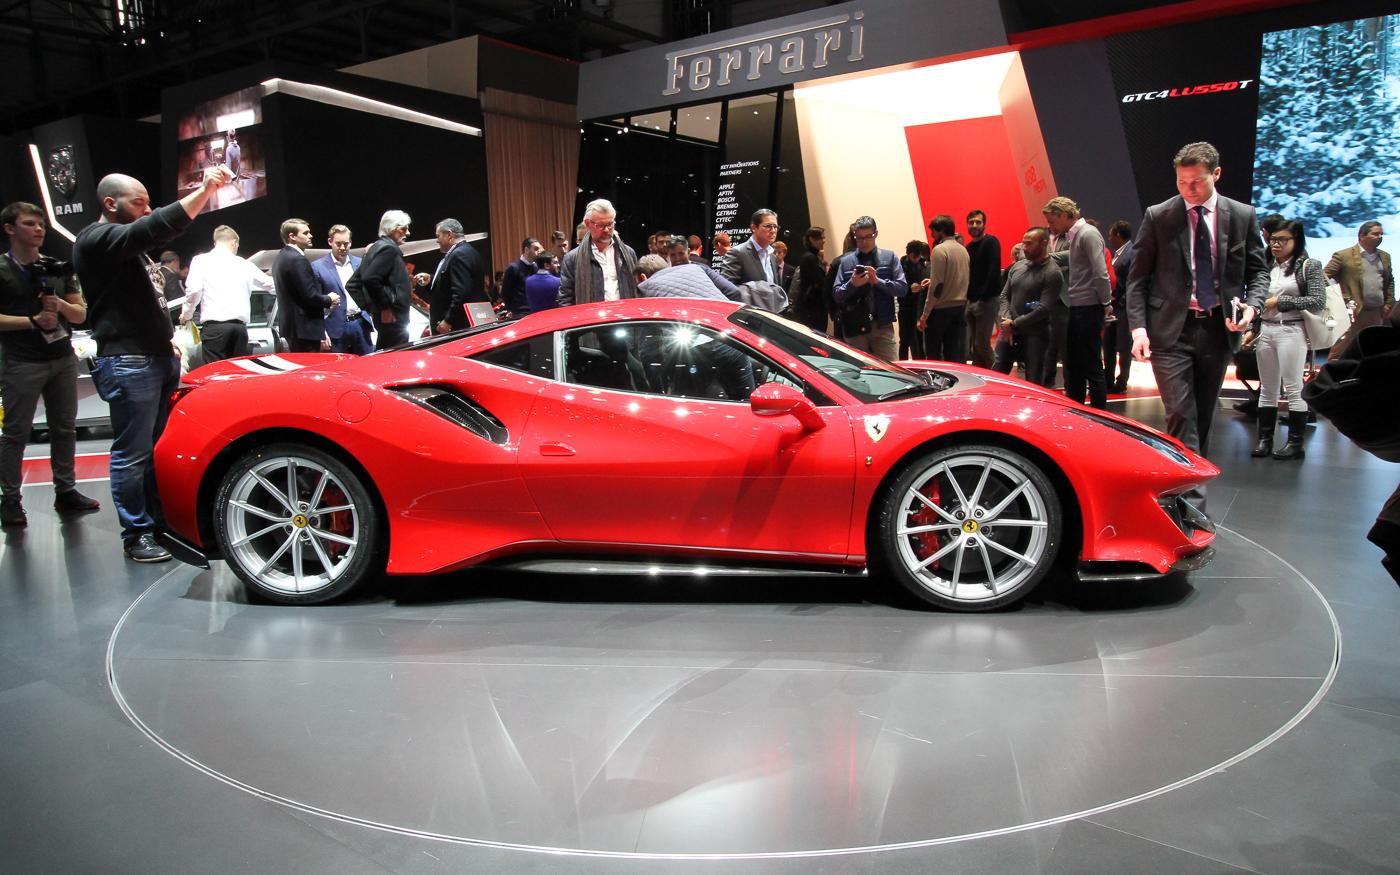 Autosalon Genève: Ferrari 488 Pista is een 'Speciale' 488 GTB